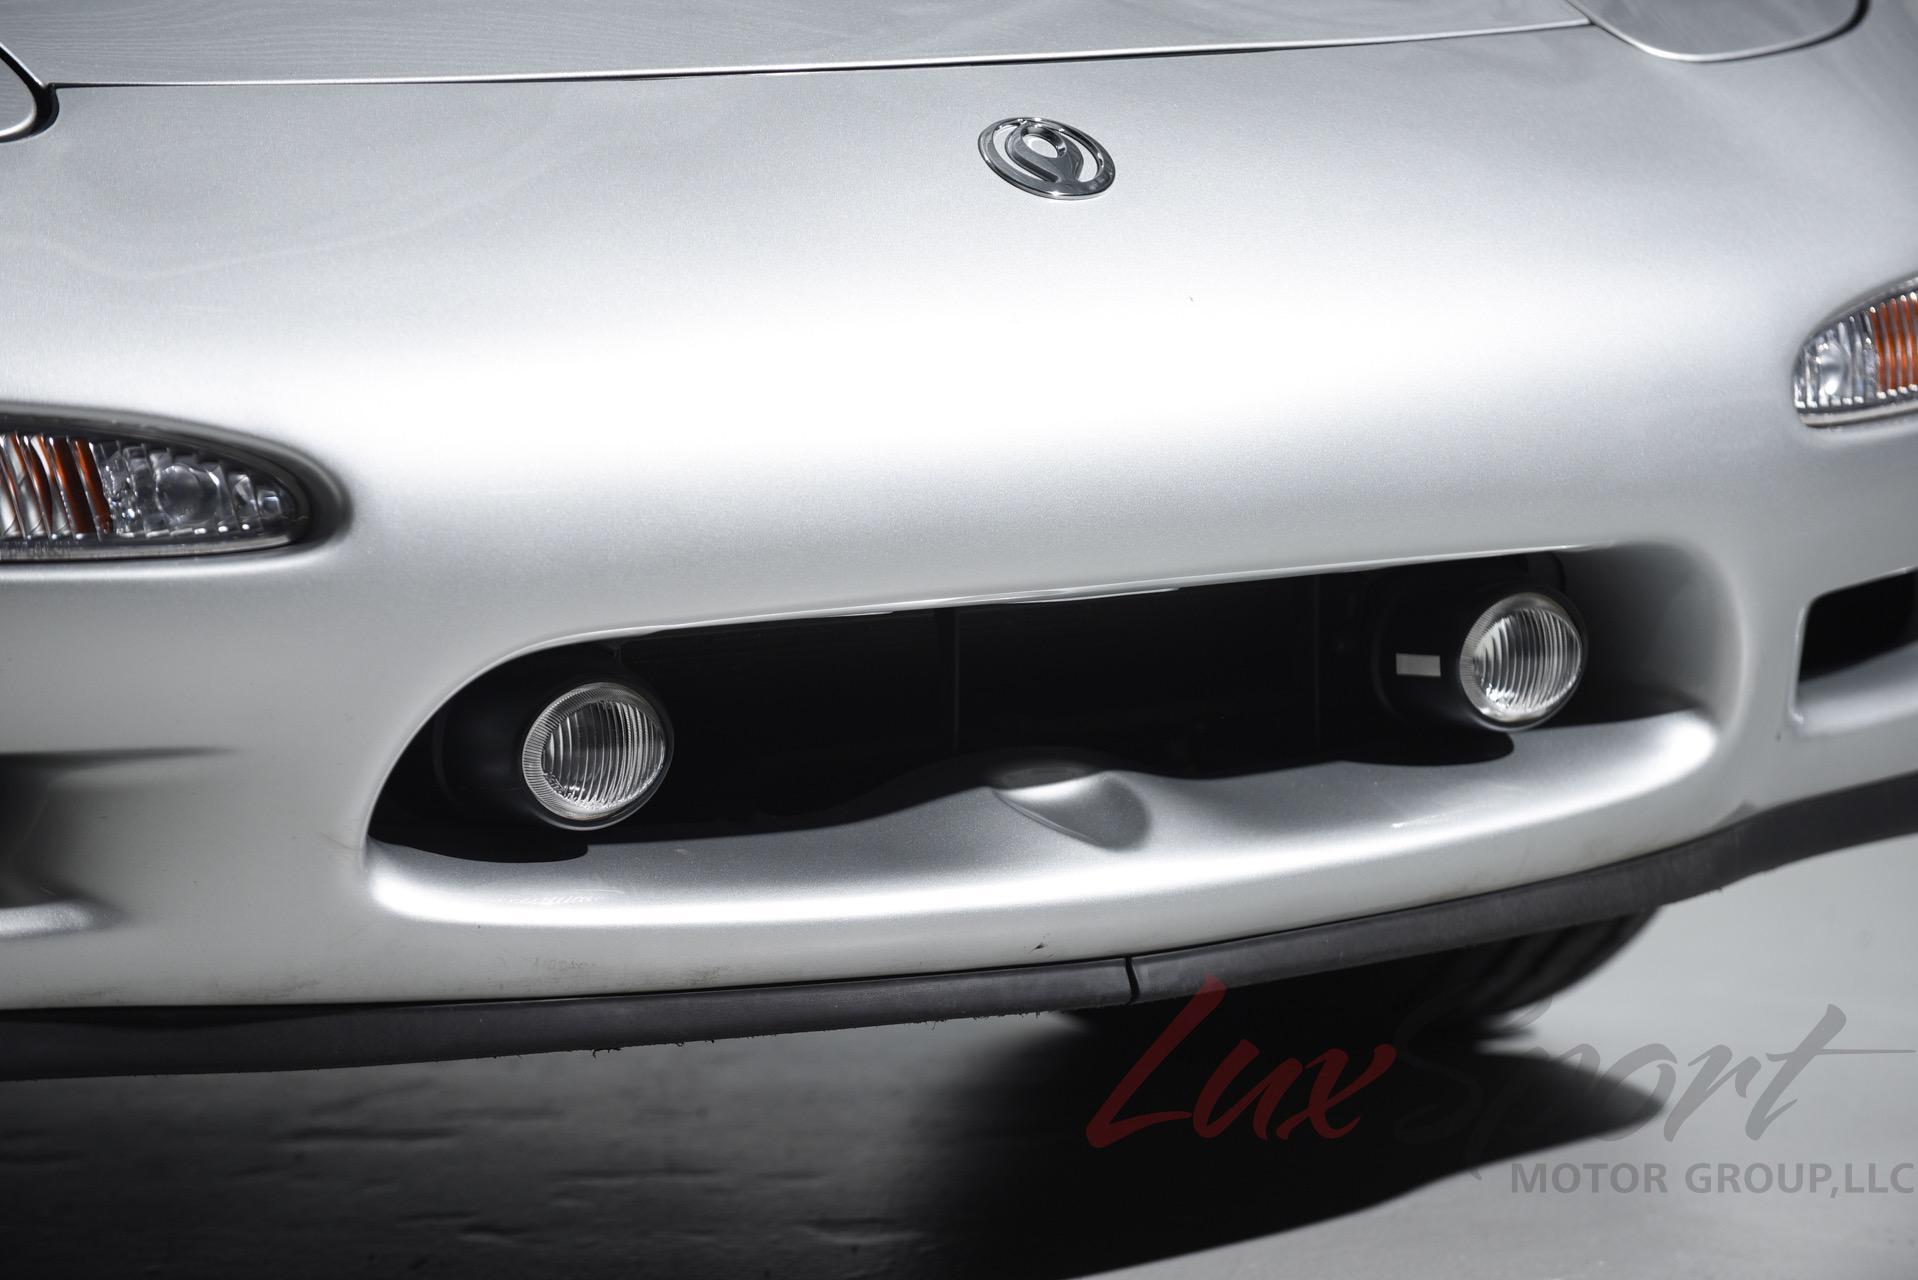 Used 1993 Mazda RX-7 Twin Turbo Coupe  | New Hyde Park, NY